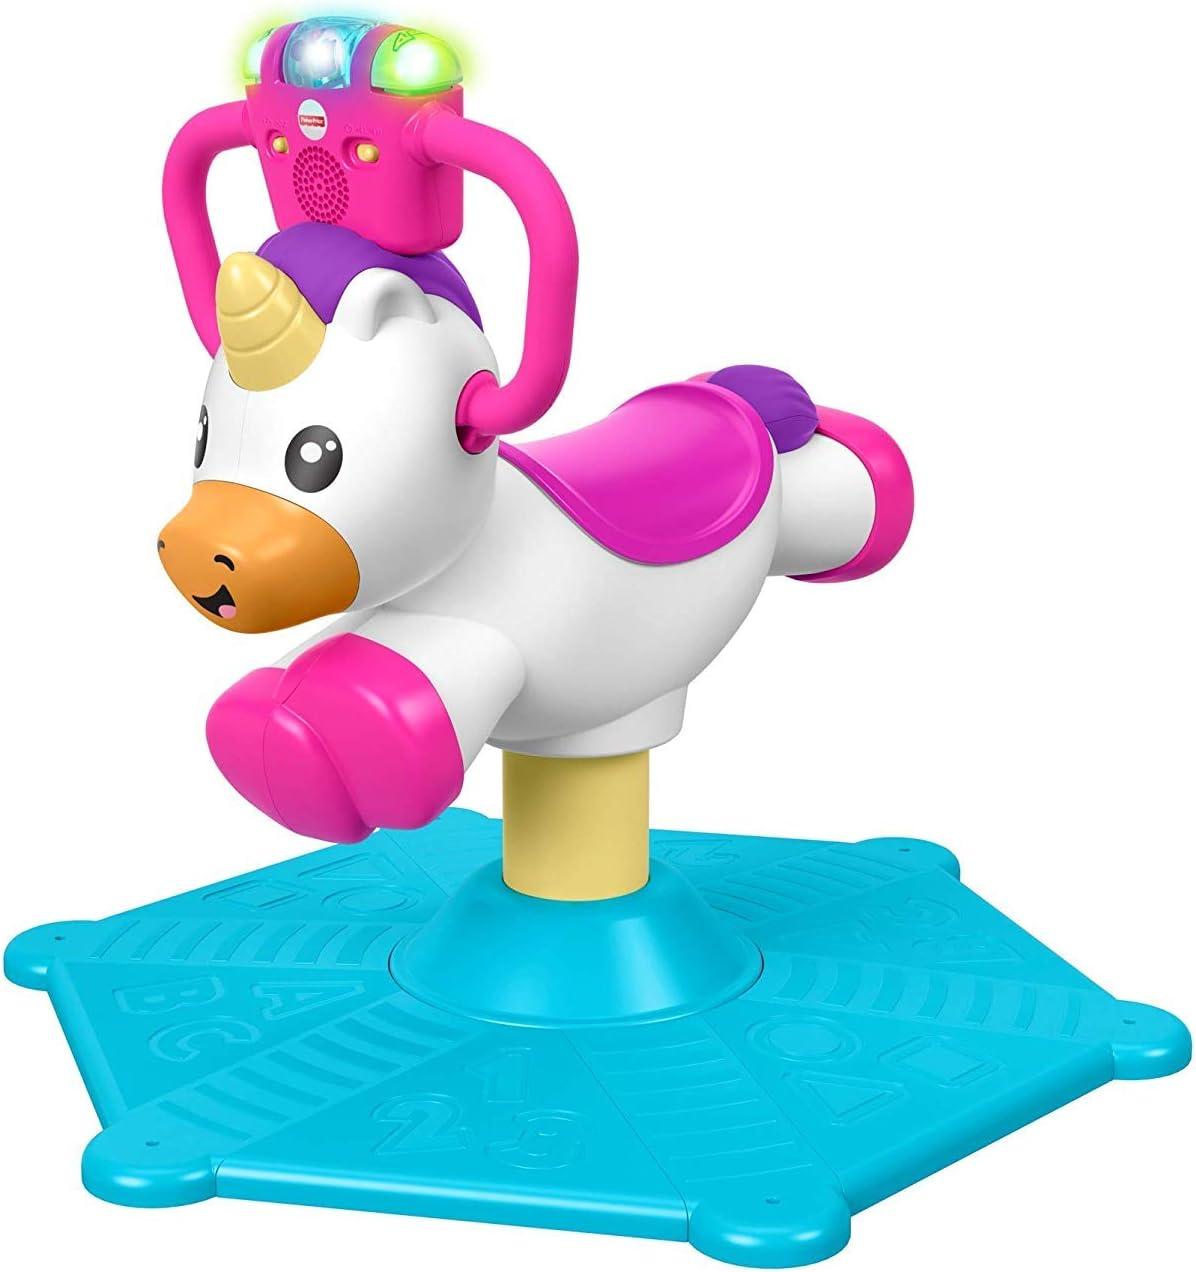 Fisher-Price GHY50 Bounce and Spin Unicornio, Juguete de Viaje Musical estacionario, Multicolor